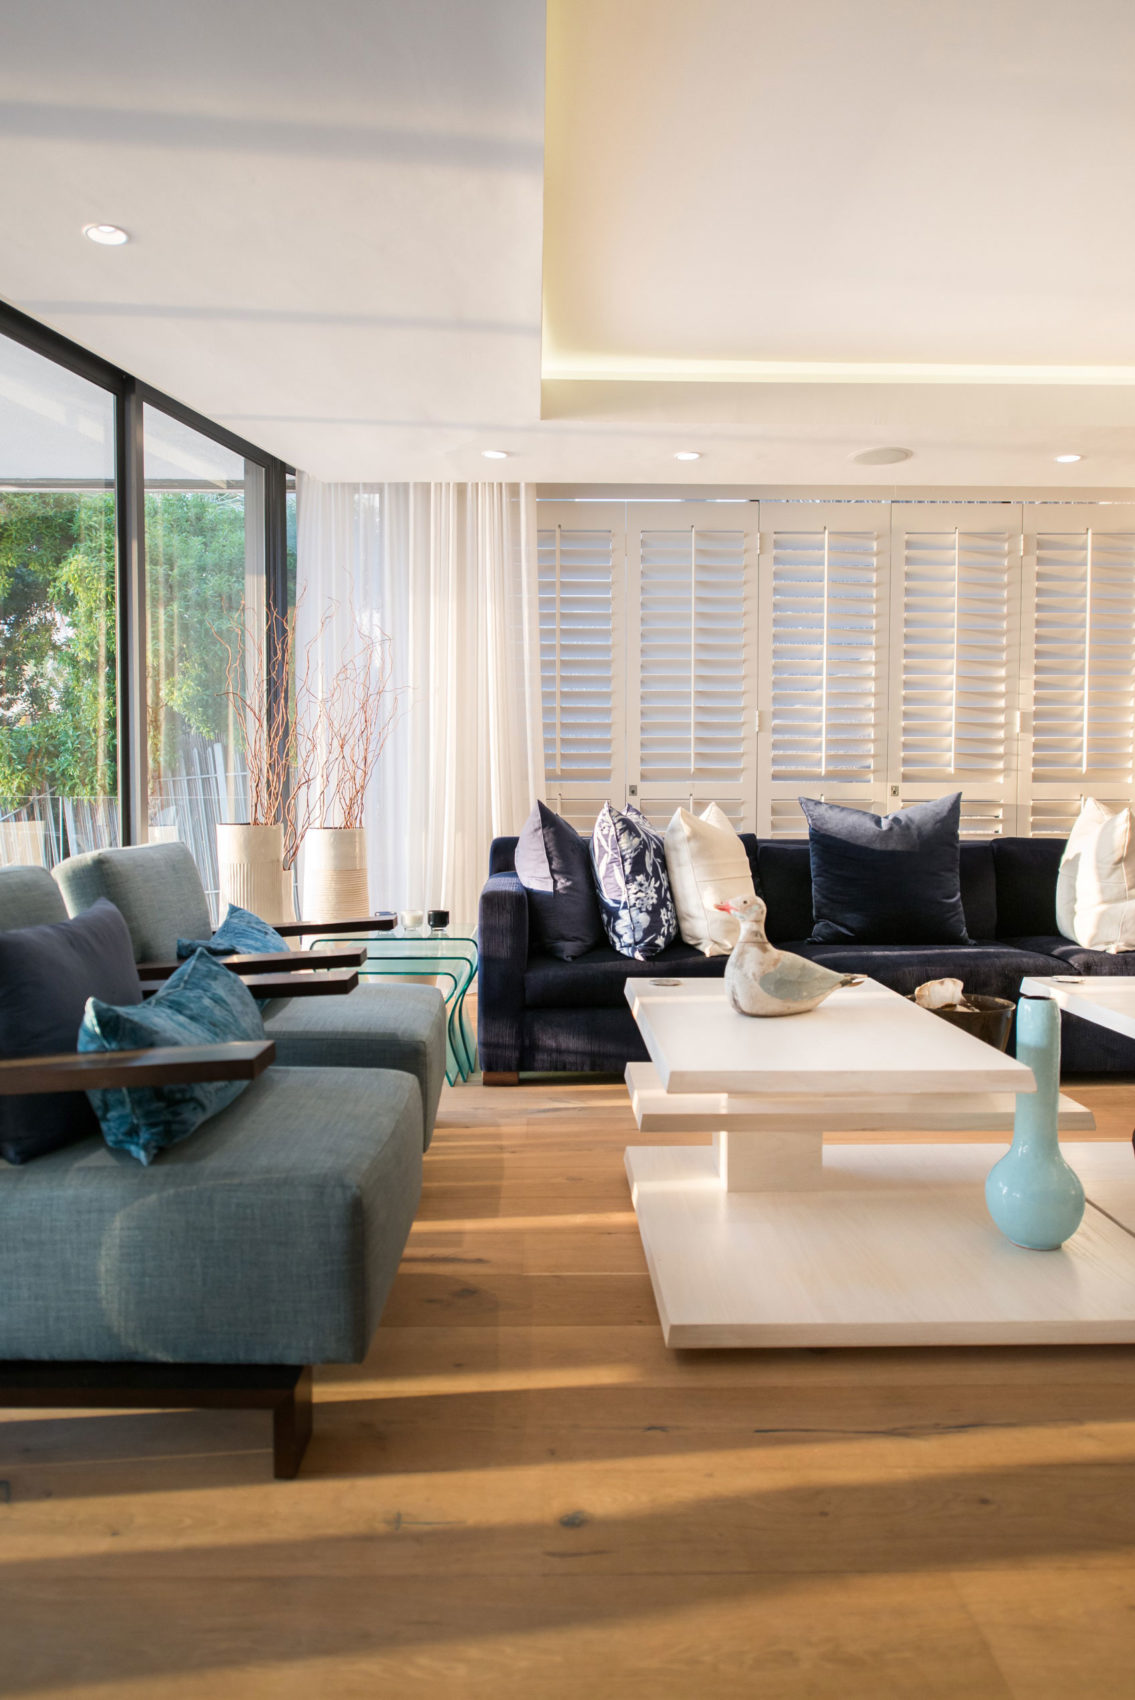 Atlantic Seaboard Apartment Refurbishment by InHouse Br (3)